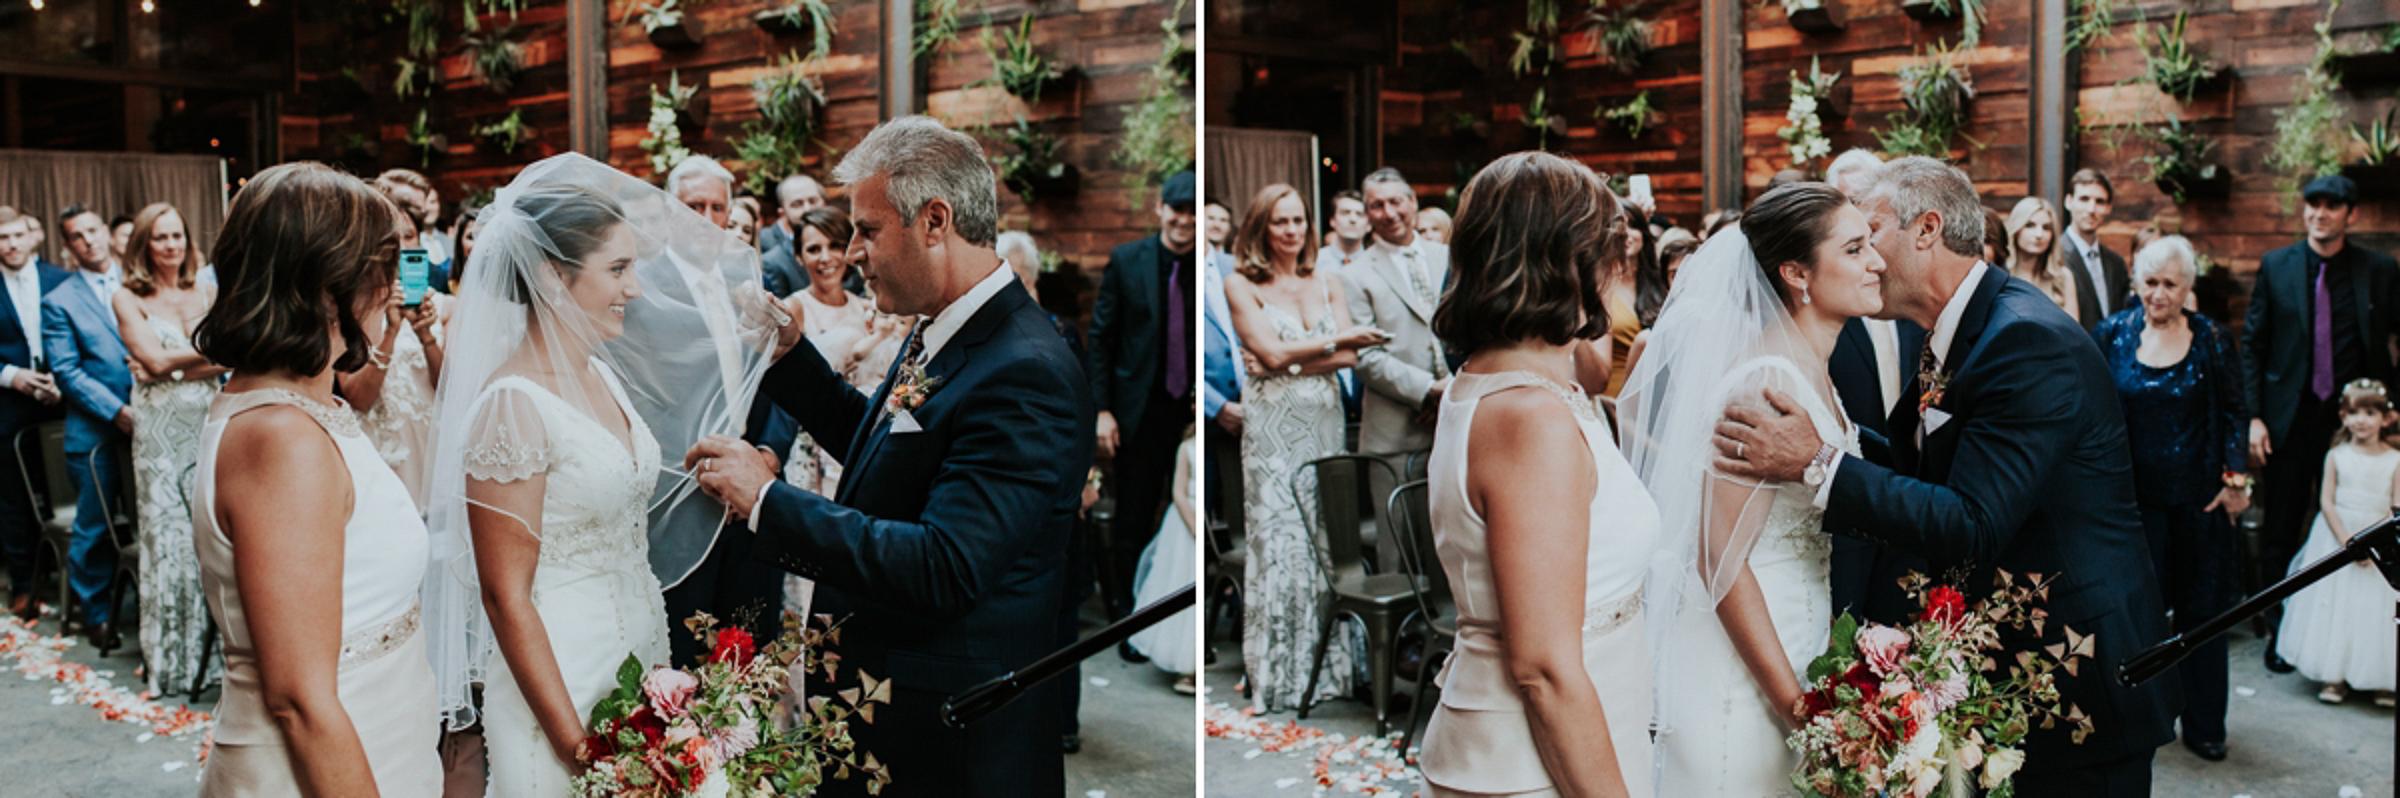 Brooklyn-Winery-NYC-Editorial-Documentary-Wedding-Photographer-Gina-Oli-127.jpg